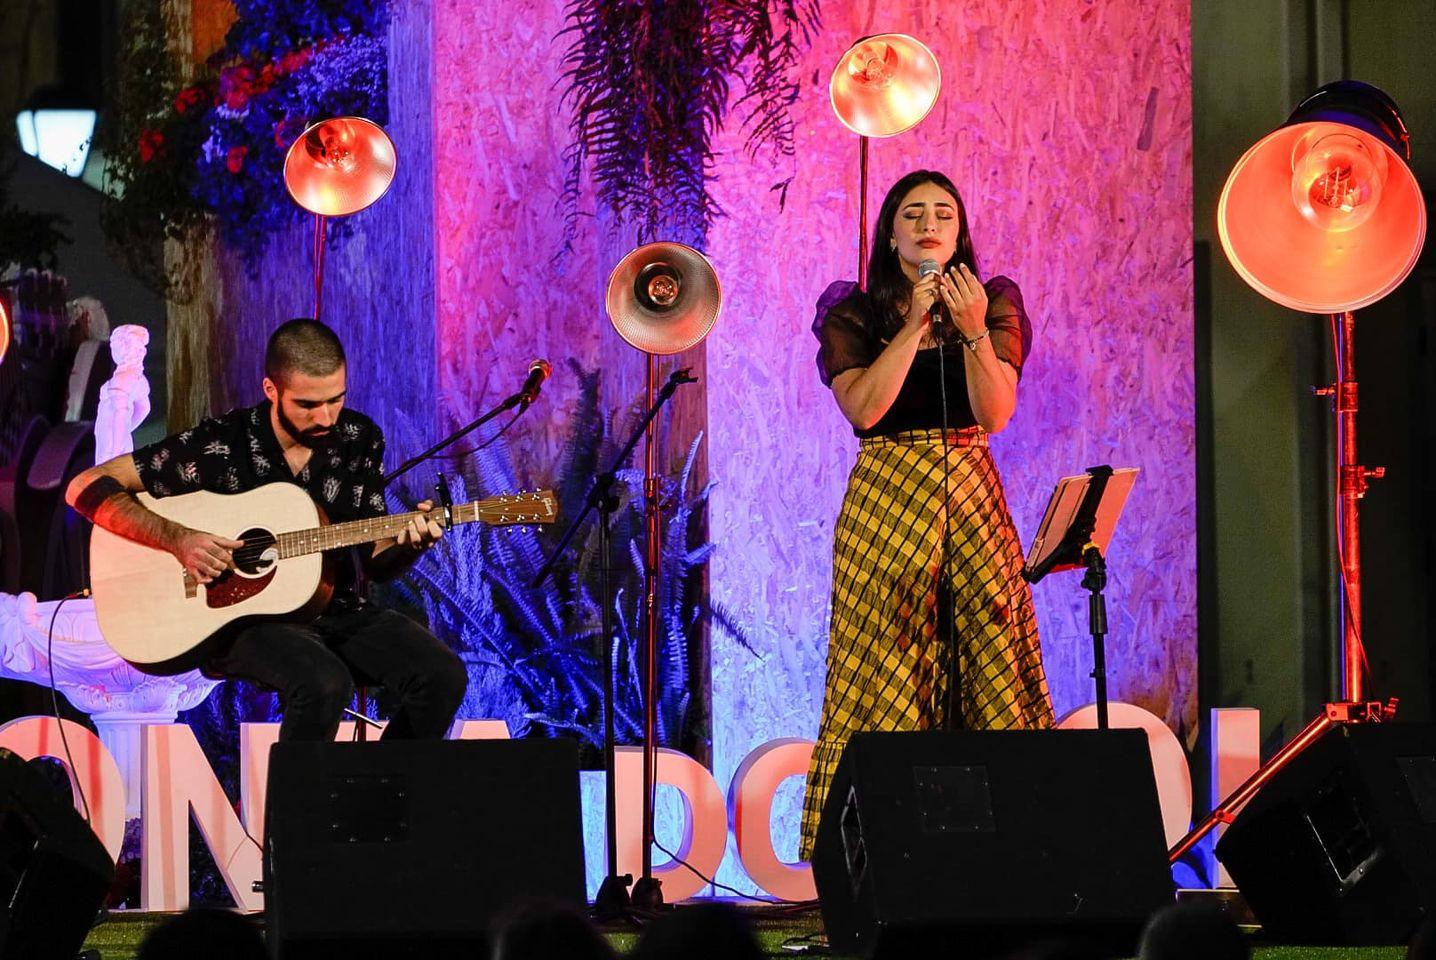 Concerto de Elisa Silva na Ponta do Sol ... momentos para recordarmos